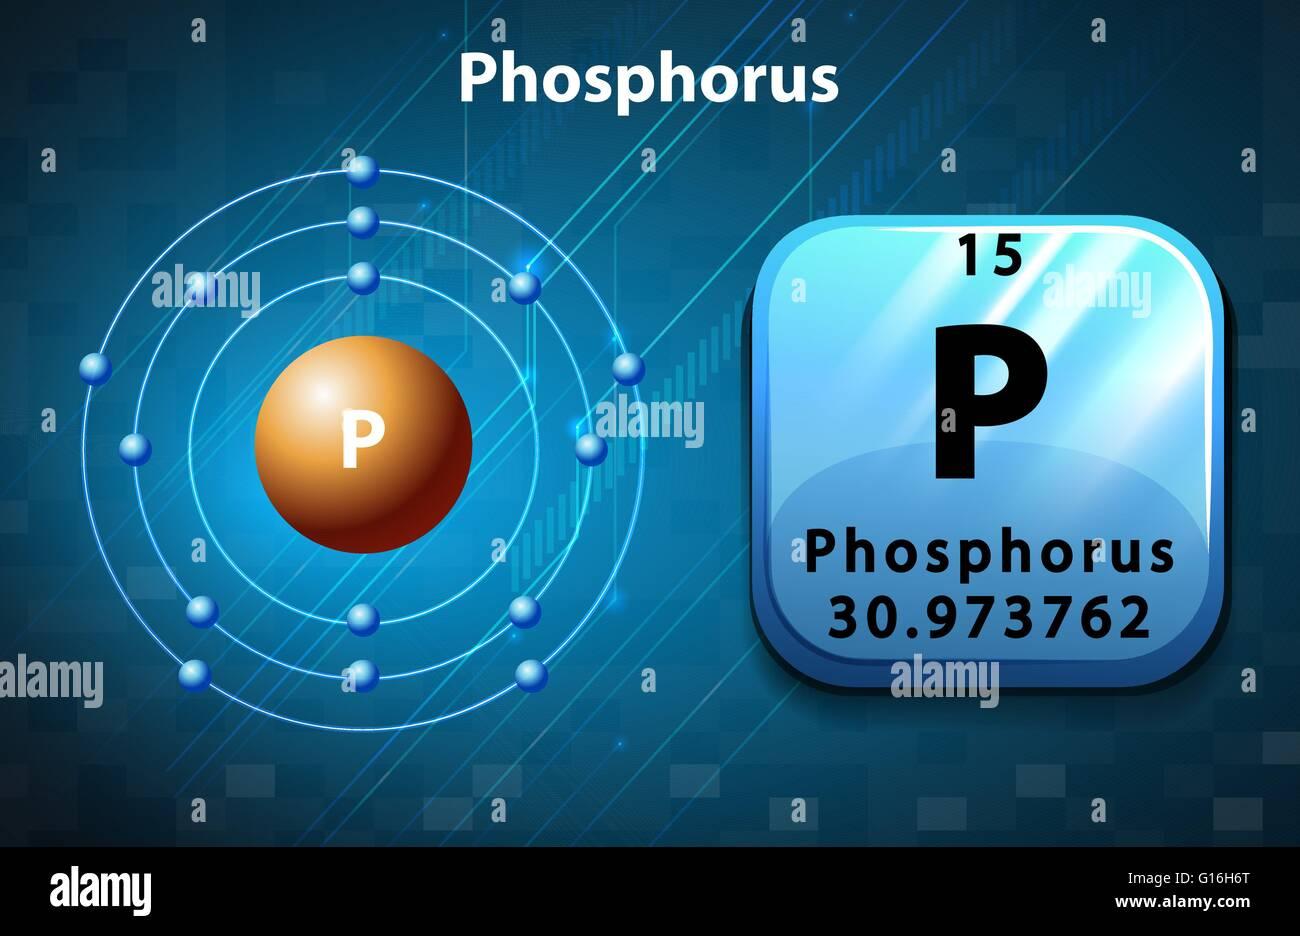 Flashcard of phosphorus atom illustration stock vector art flashcard of phosphorus atom illustration ccuart Choice Image